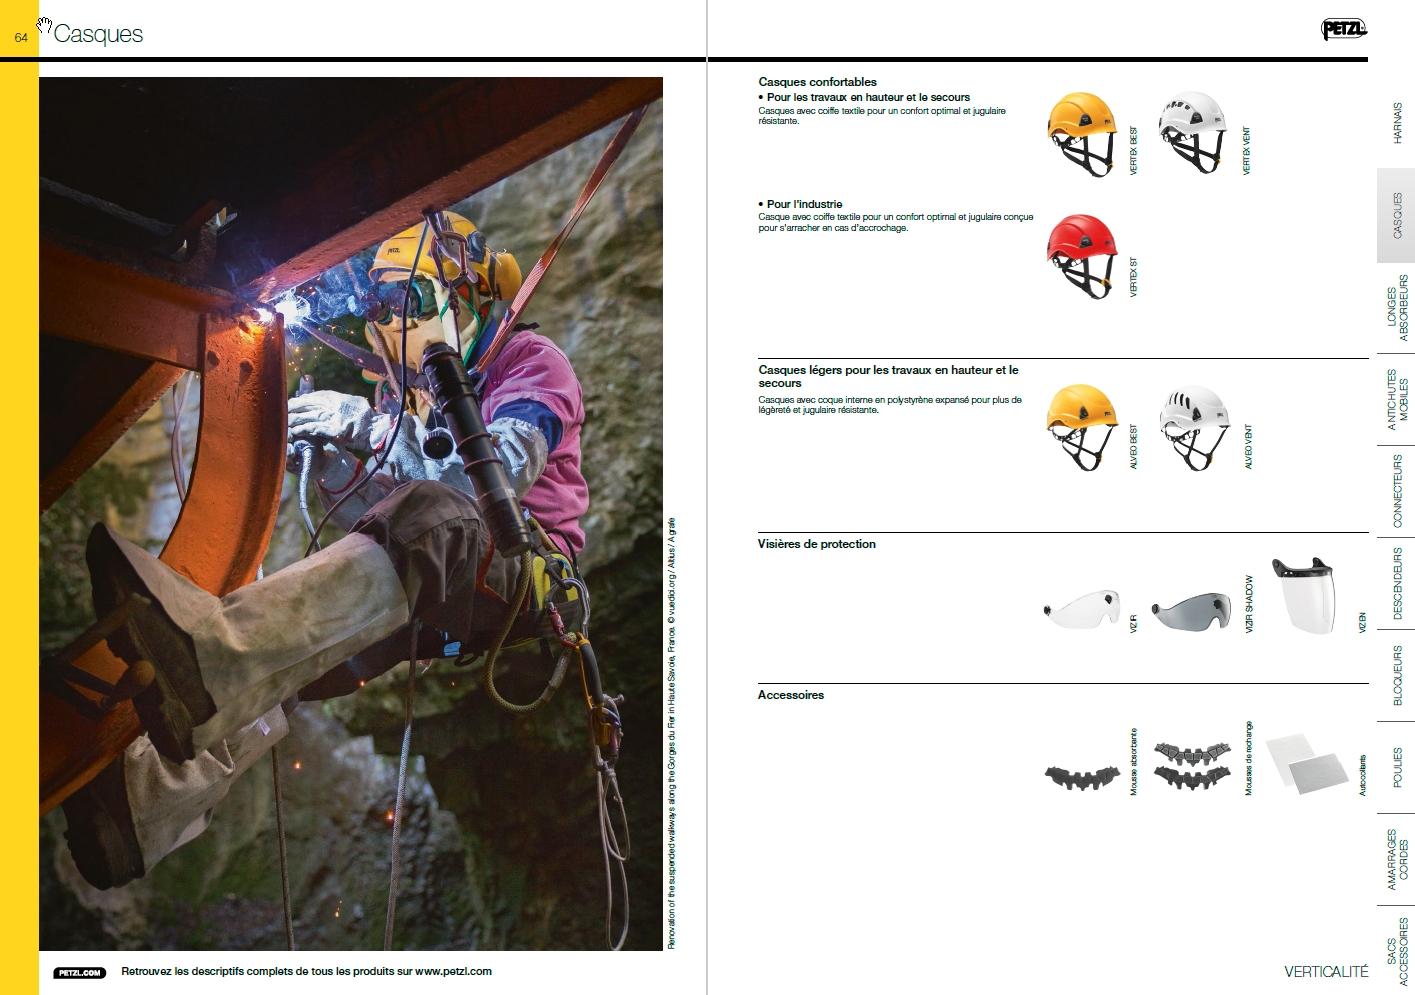 2015-11-03 09_38_49-Petzl-catalog-pro-2016-FR.pdf - Adobe Acrobat Reader DC